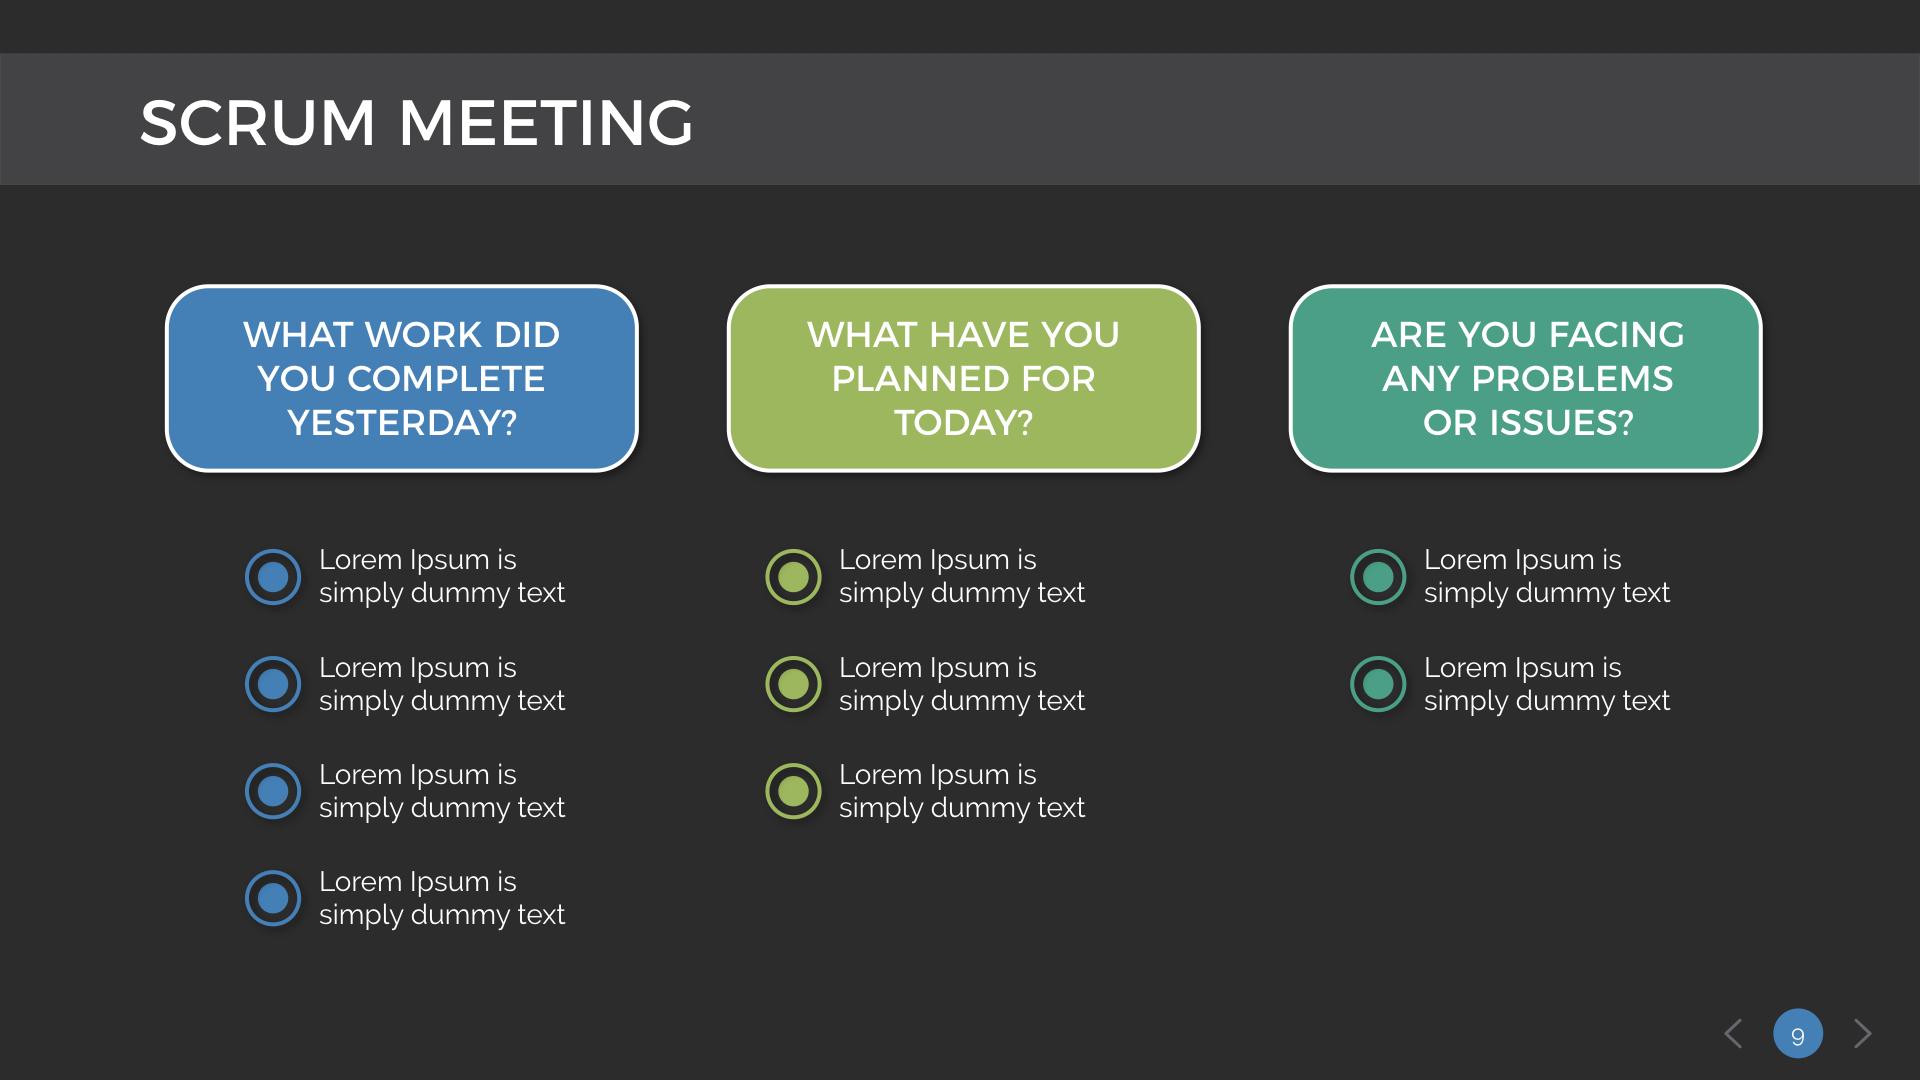 Scrum Process Keynote Presentation Template by SanaNik   GraphicRiver